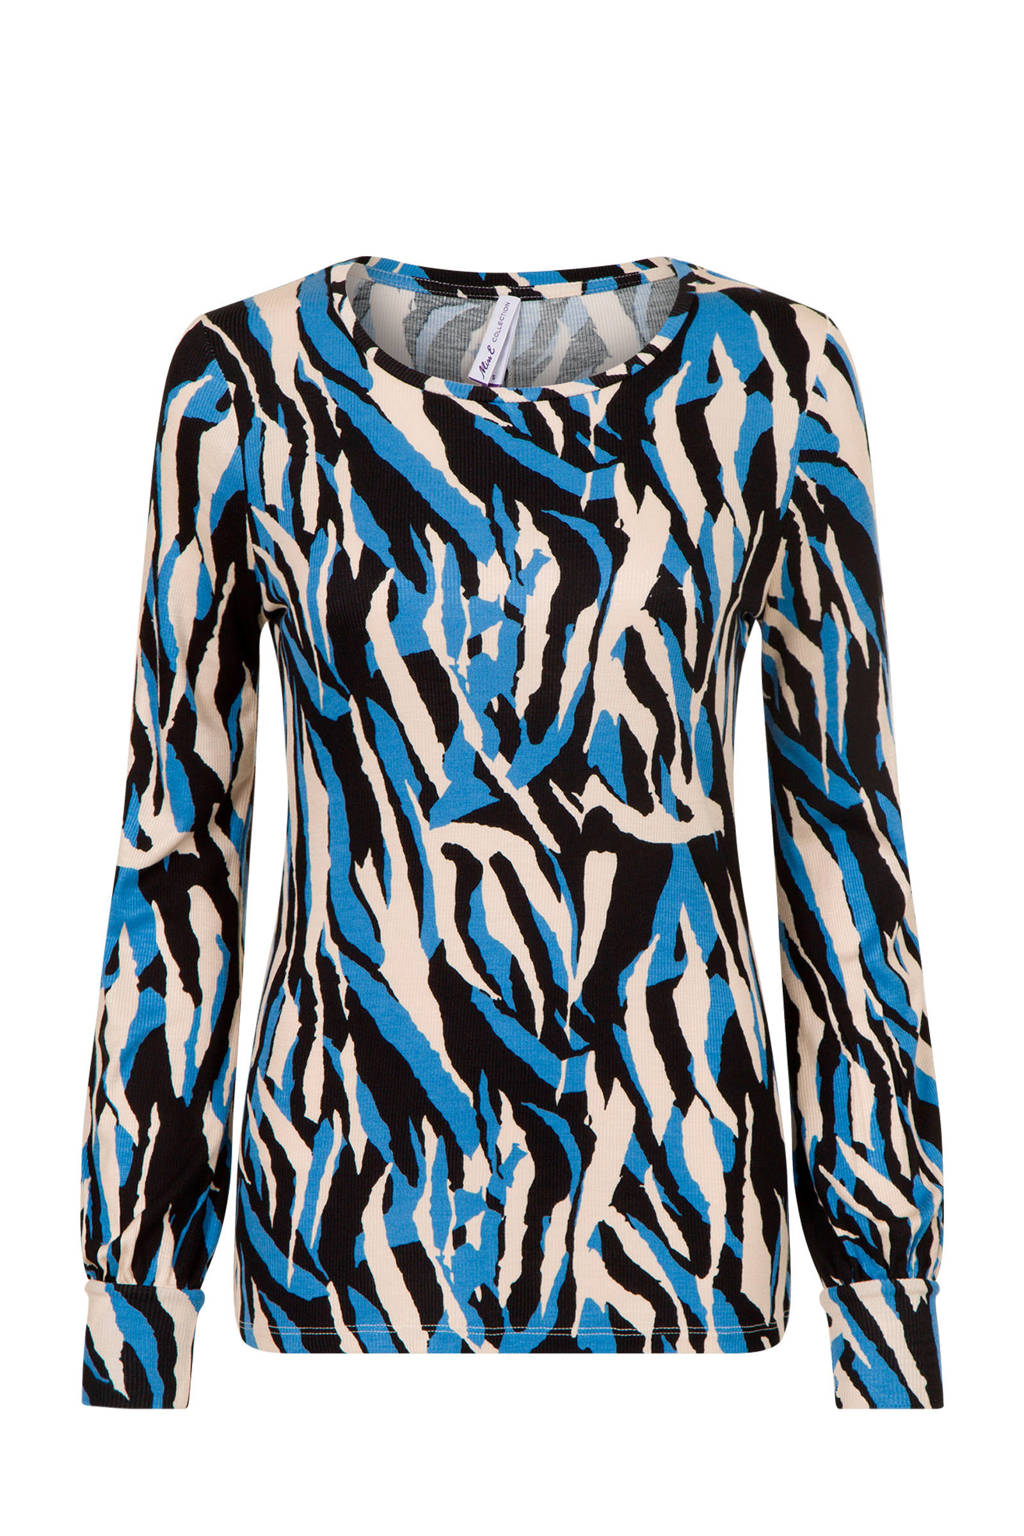 Miss Etam Regulier T-shirt met all over print blauw, Blauw